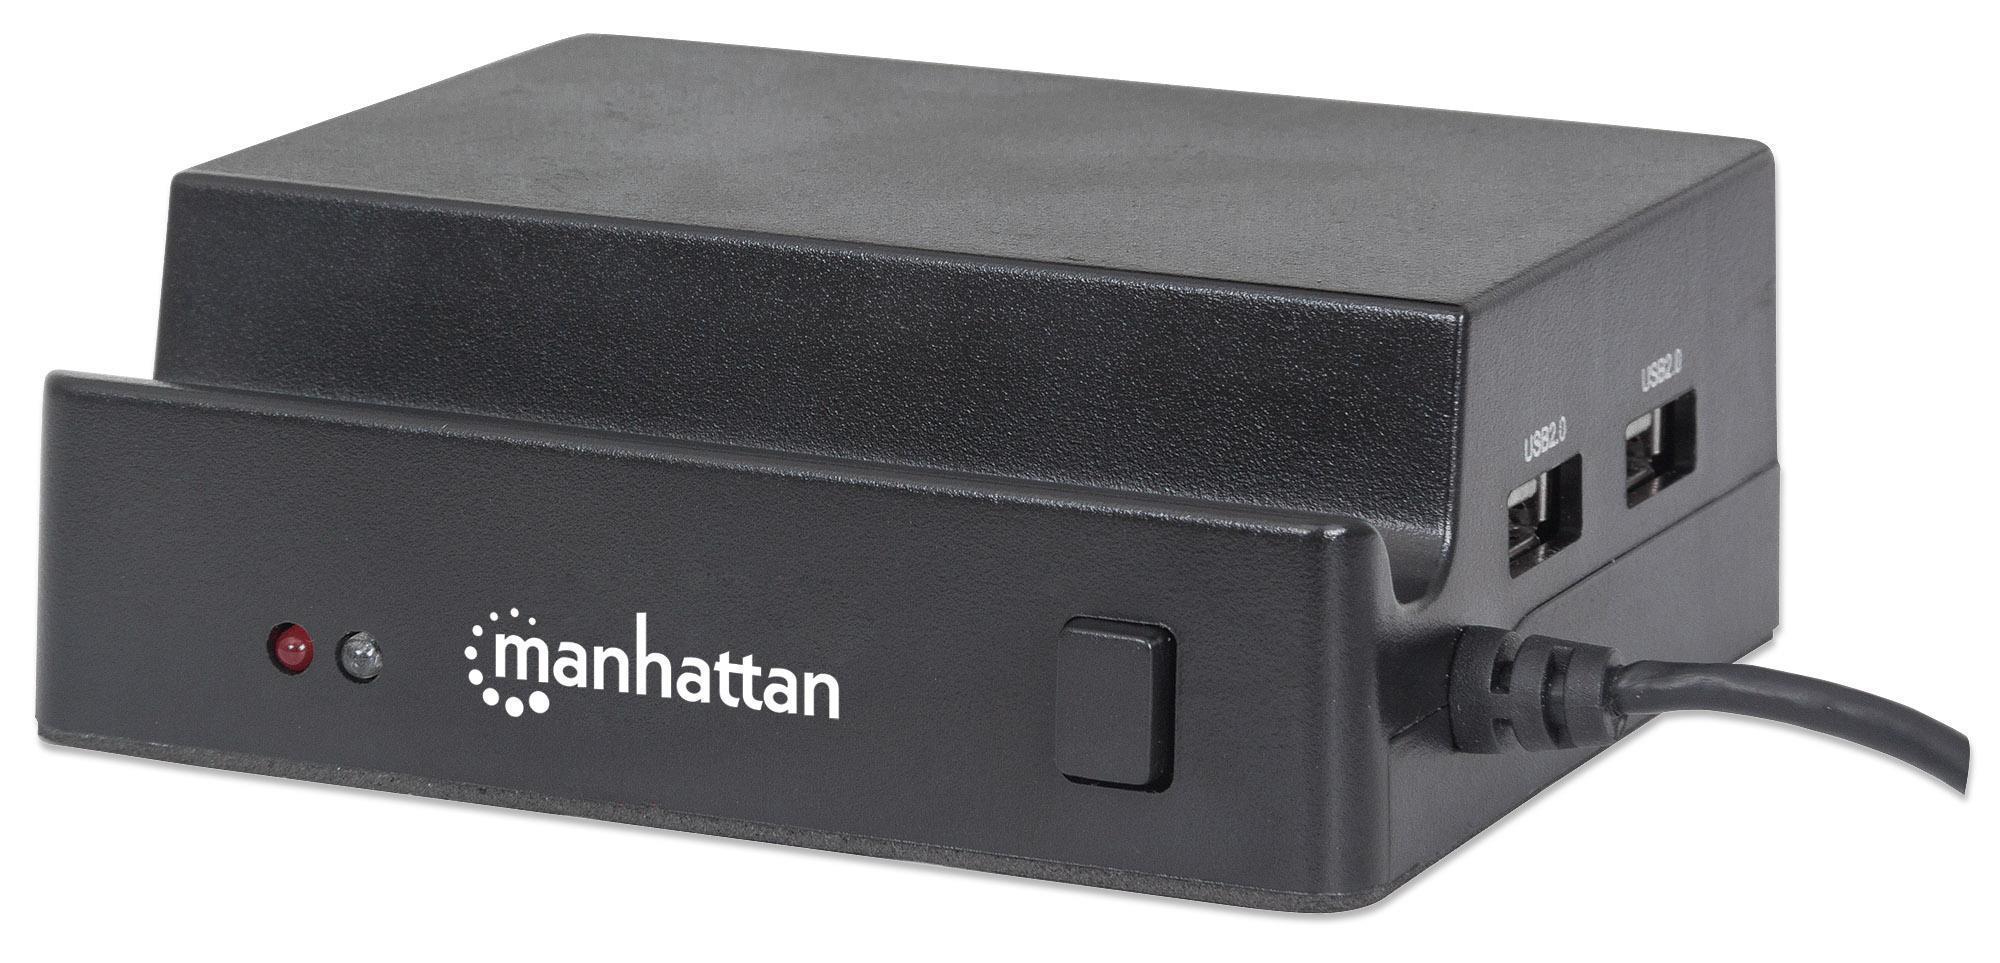 Manhattan Docking Station 3 Porte USB Ricarica Smartphone e Tablet OTG Nero